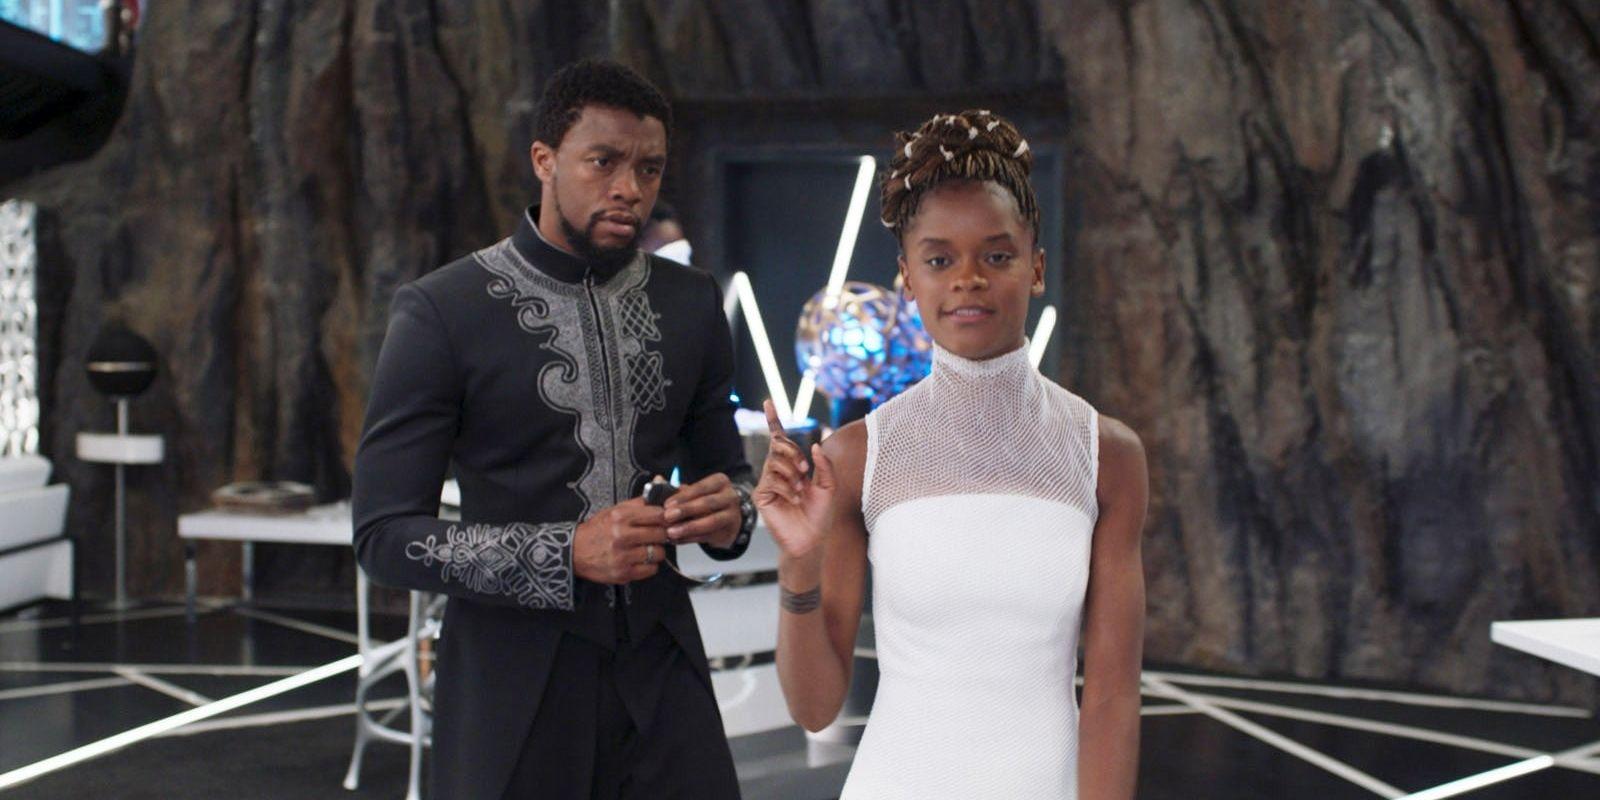 Black Panther 2 Without Chadwick Boseman Would Be Strange Says Letitia Wright